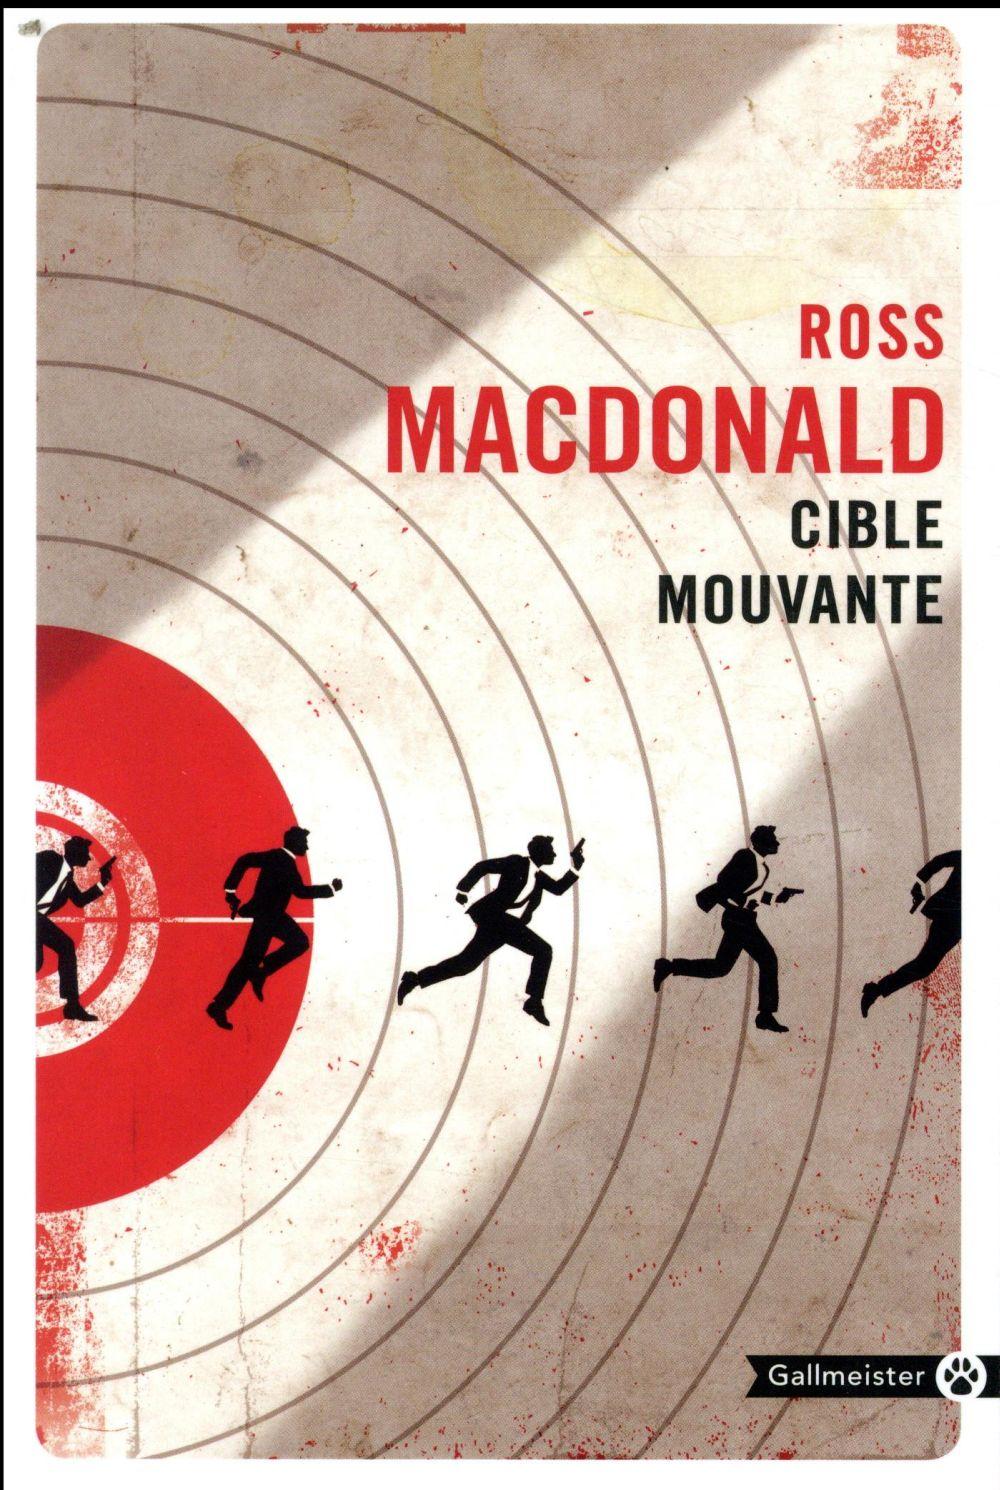 CIBLE MOUVANTE MACDONALD ROSS GALLMEISTER